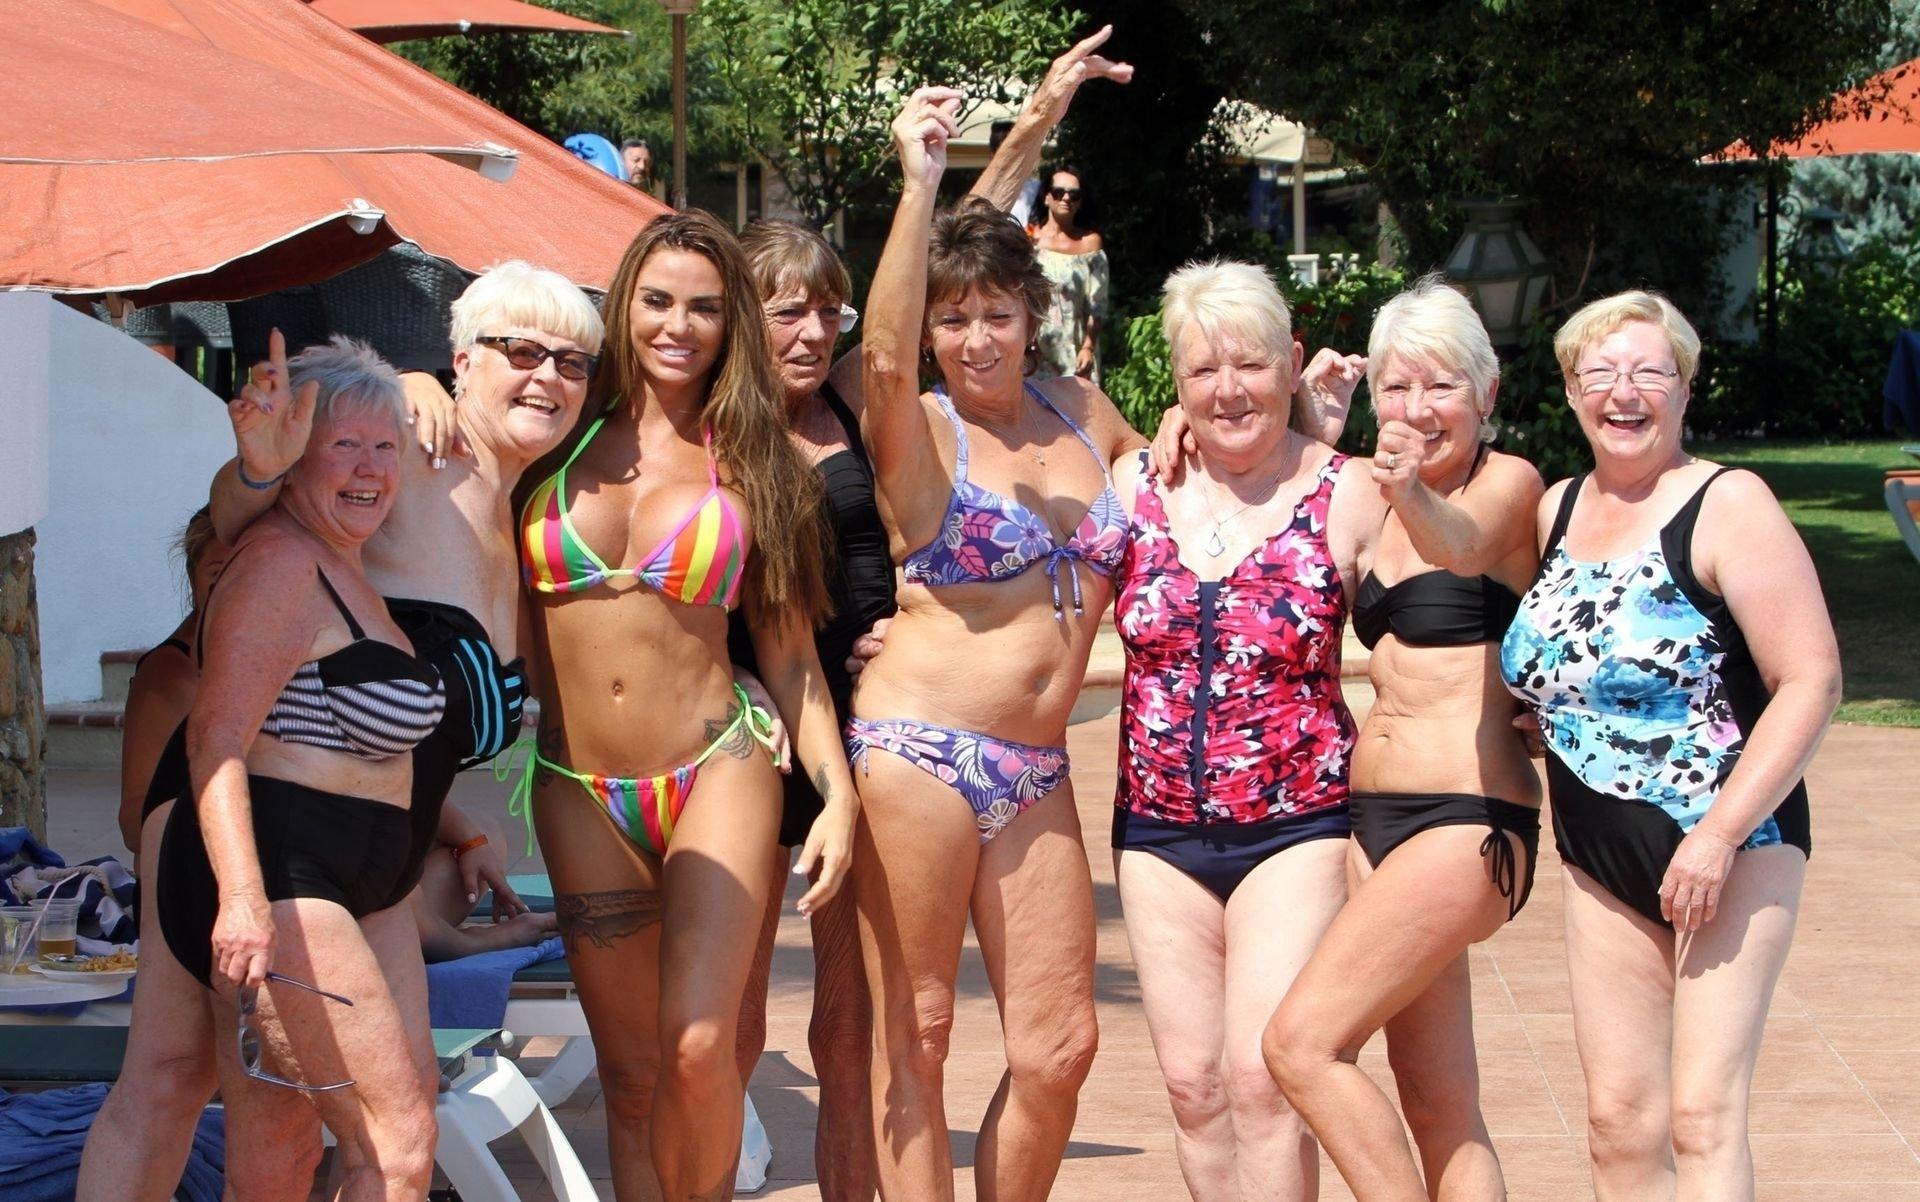 Katie-Price-Nude-Sexy-TheFappeningBlog.com-4.jpg